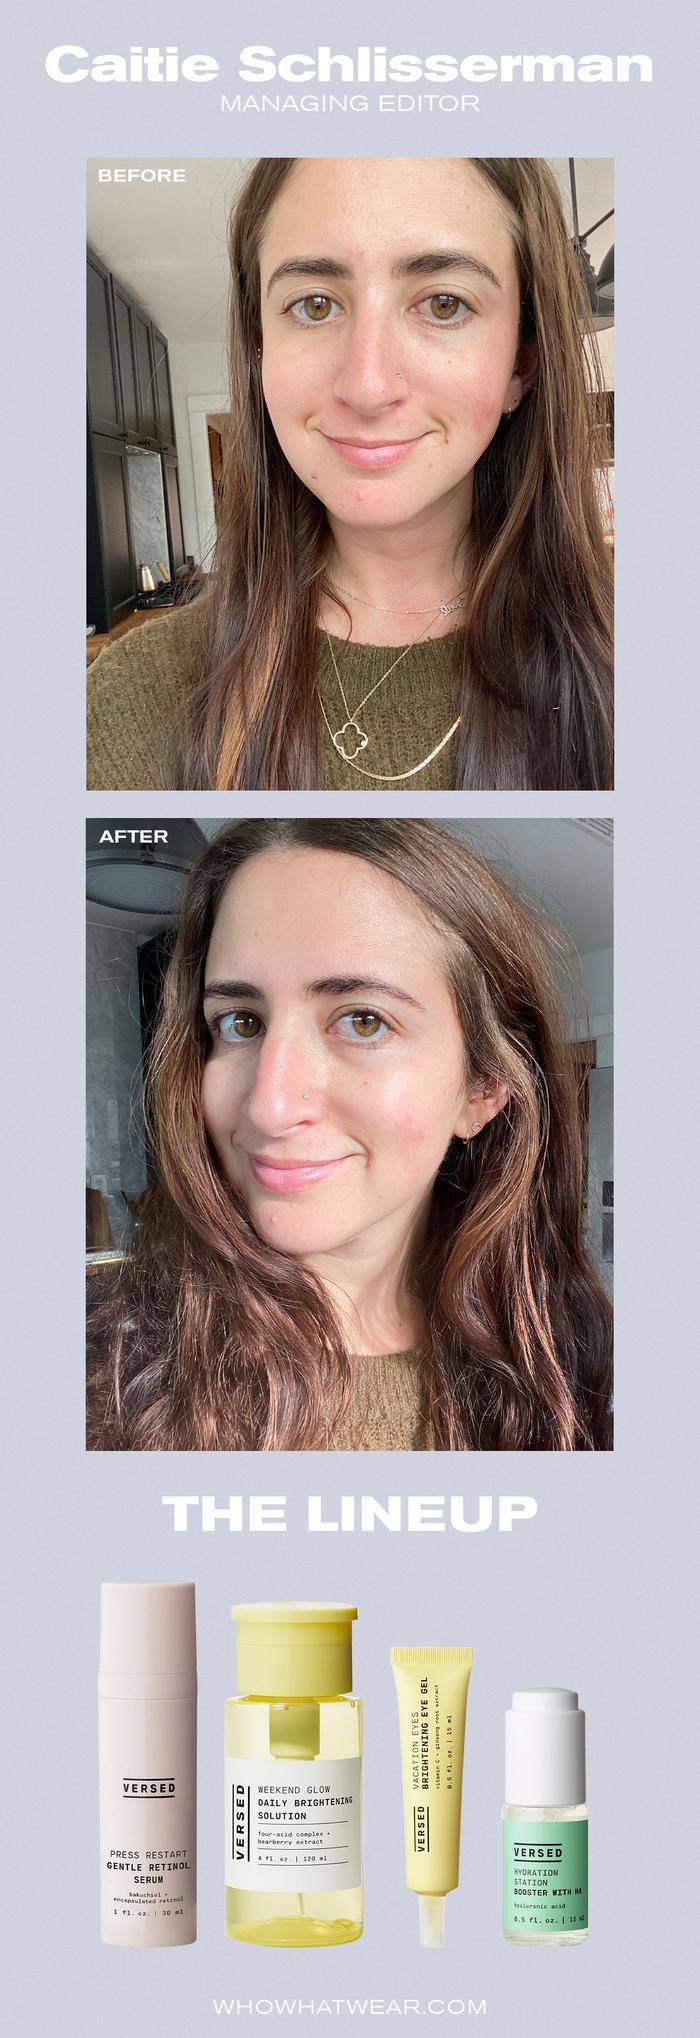 Caitie Schlisserman Versed Skincare Reviews: